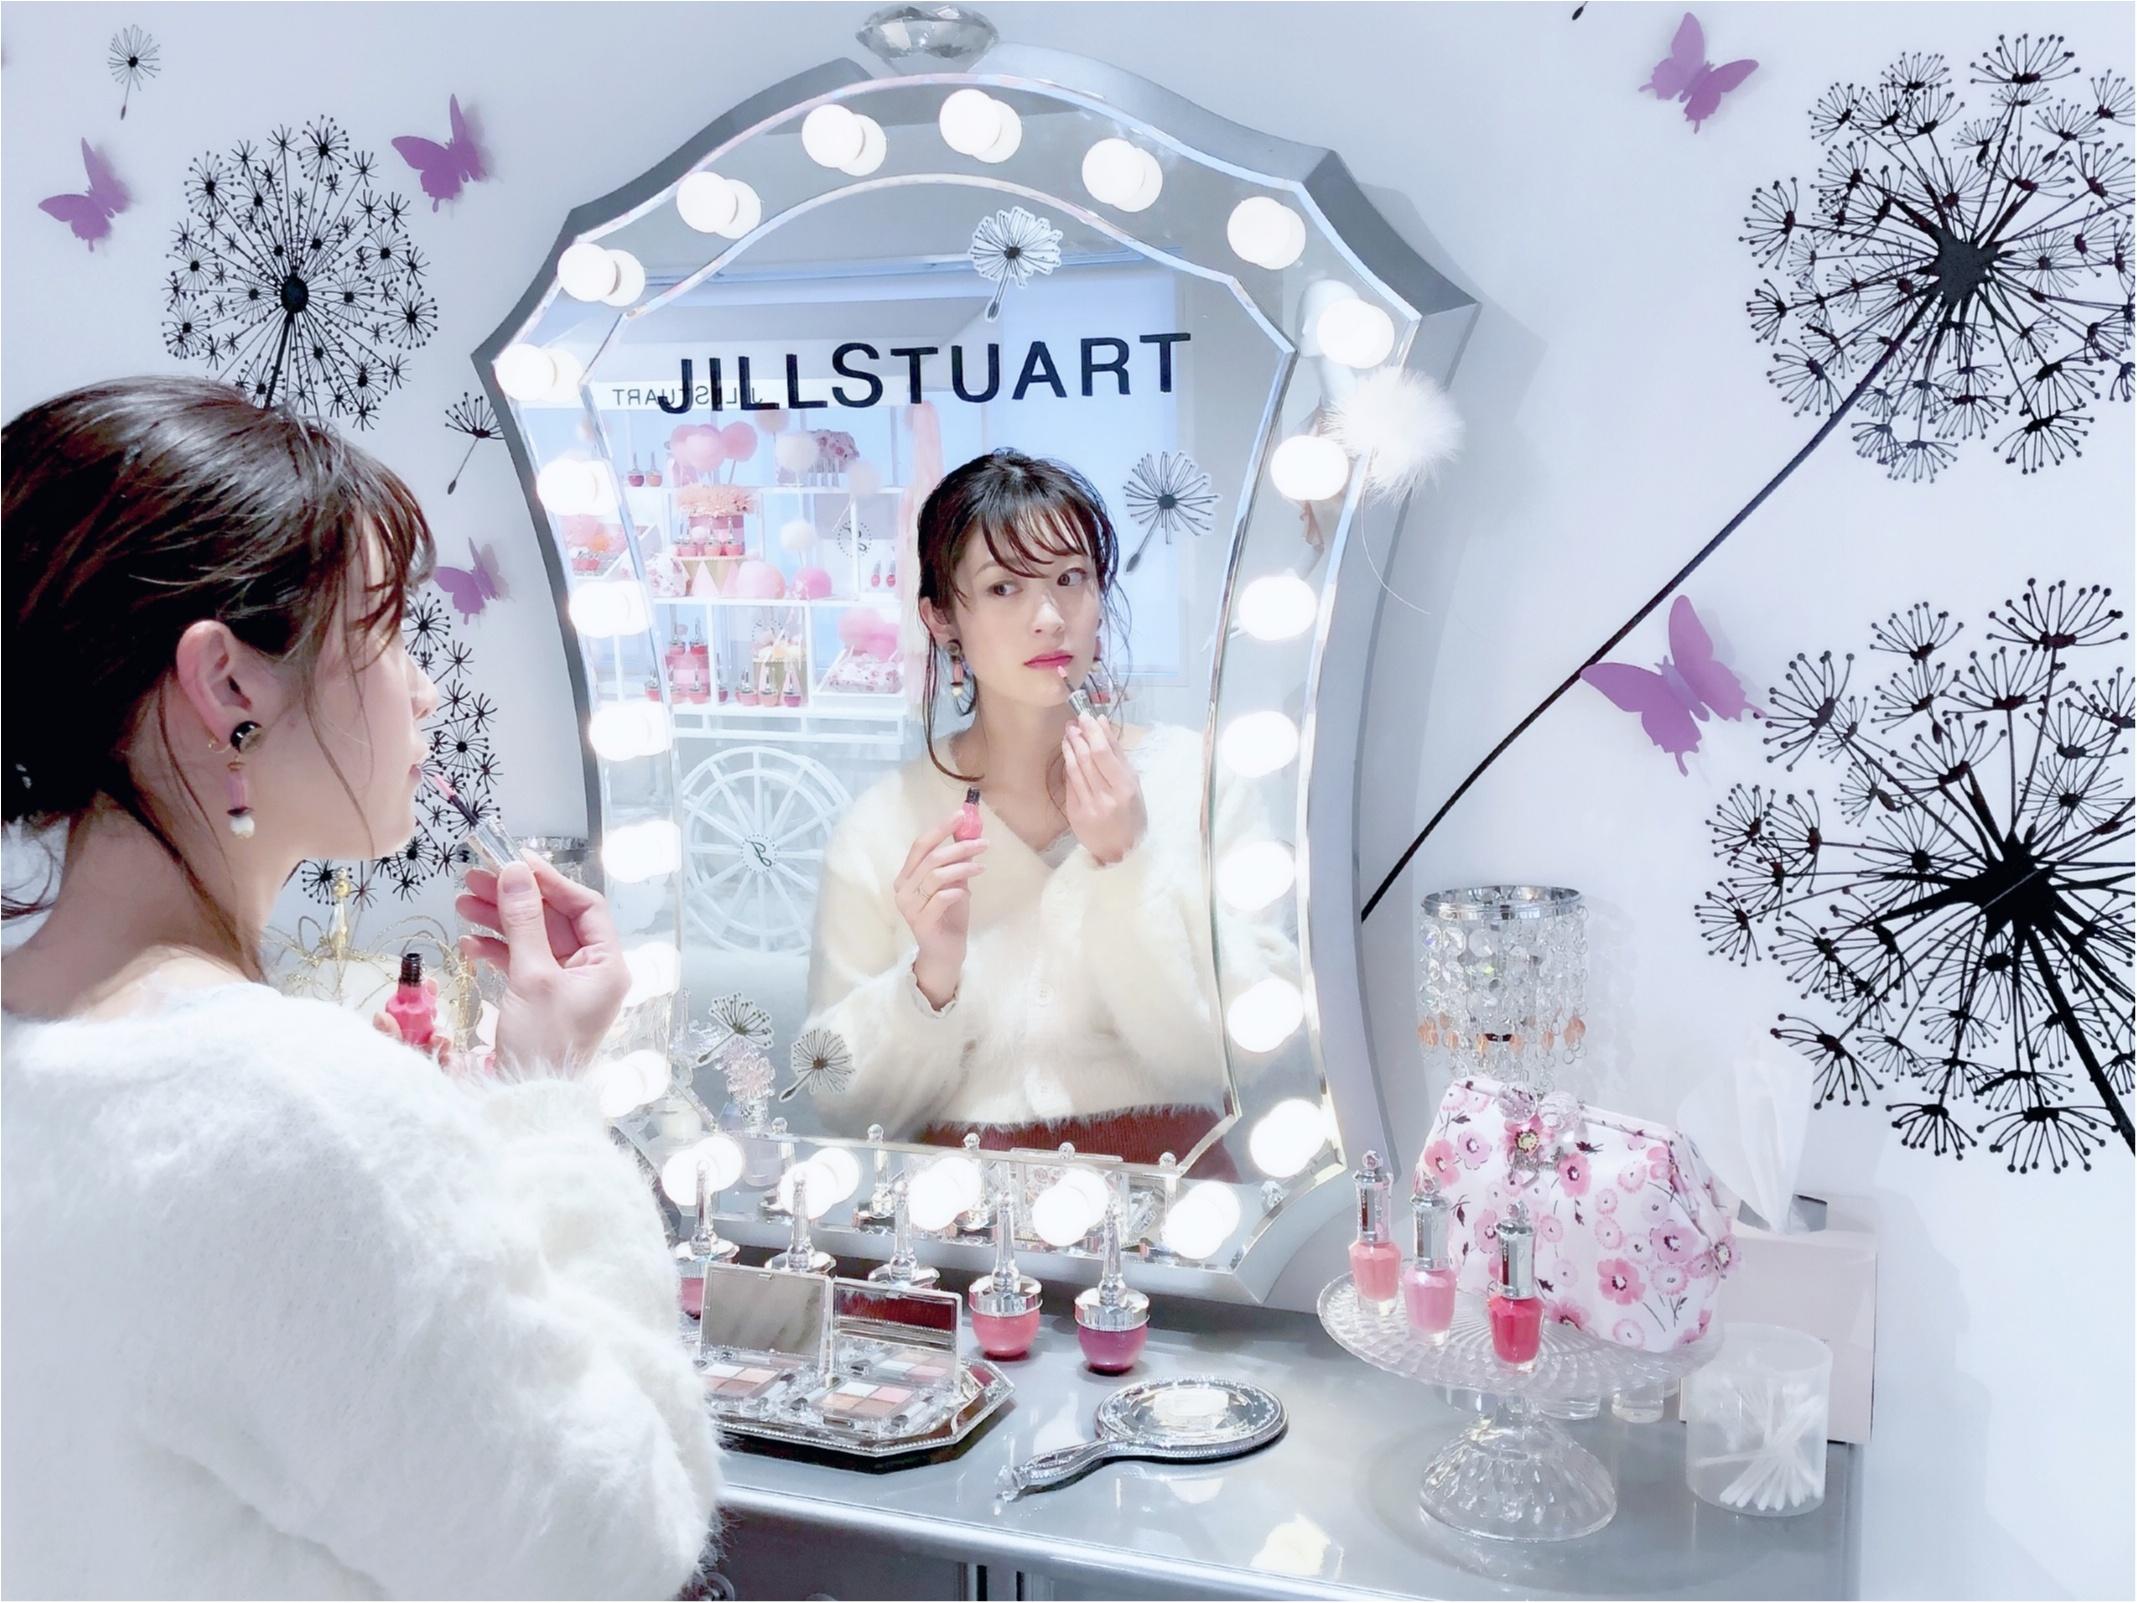 【jillstuart beauty】ジルの世界を満喫!新作コスメも試せるフォトジェニックスポットに行ってきました❤️_9